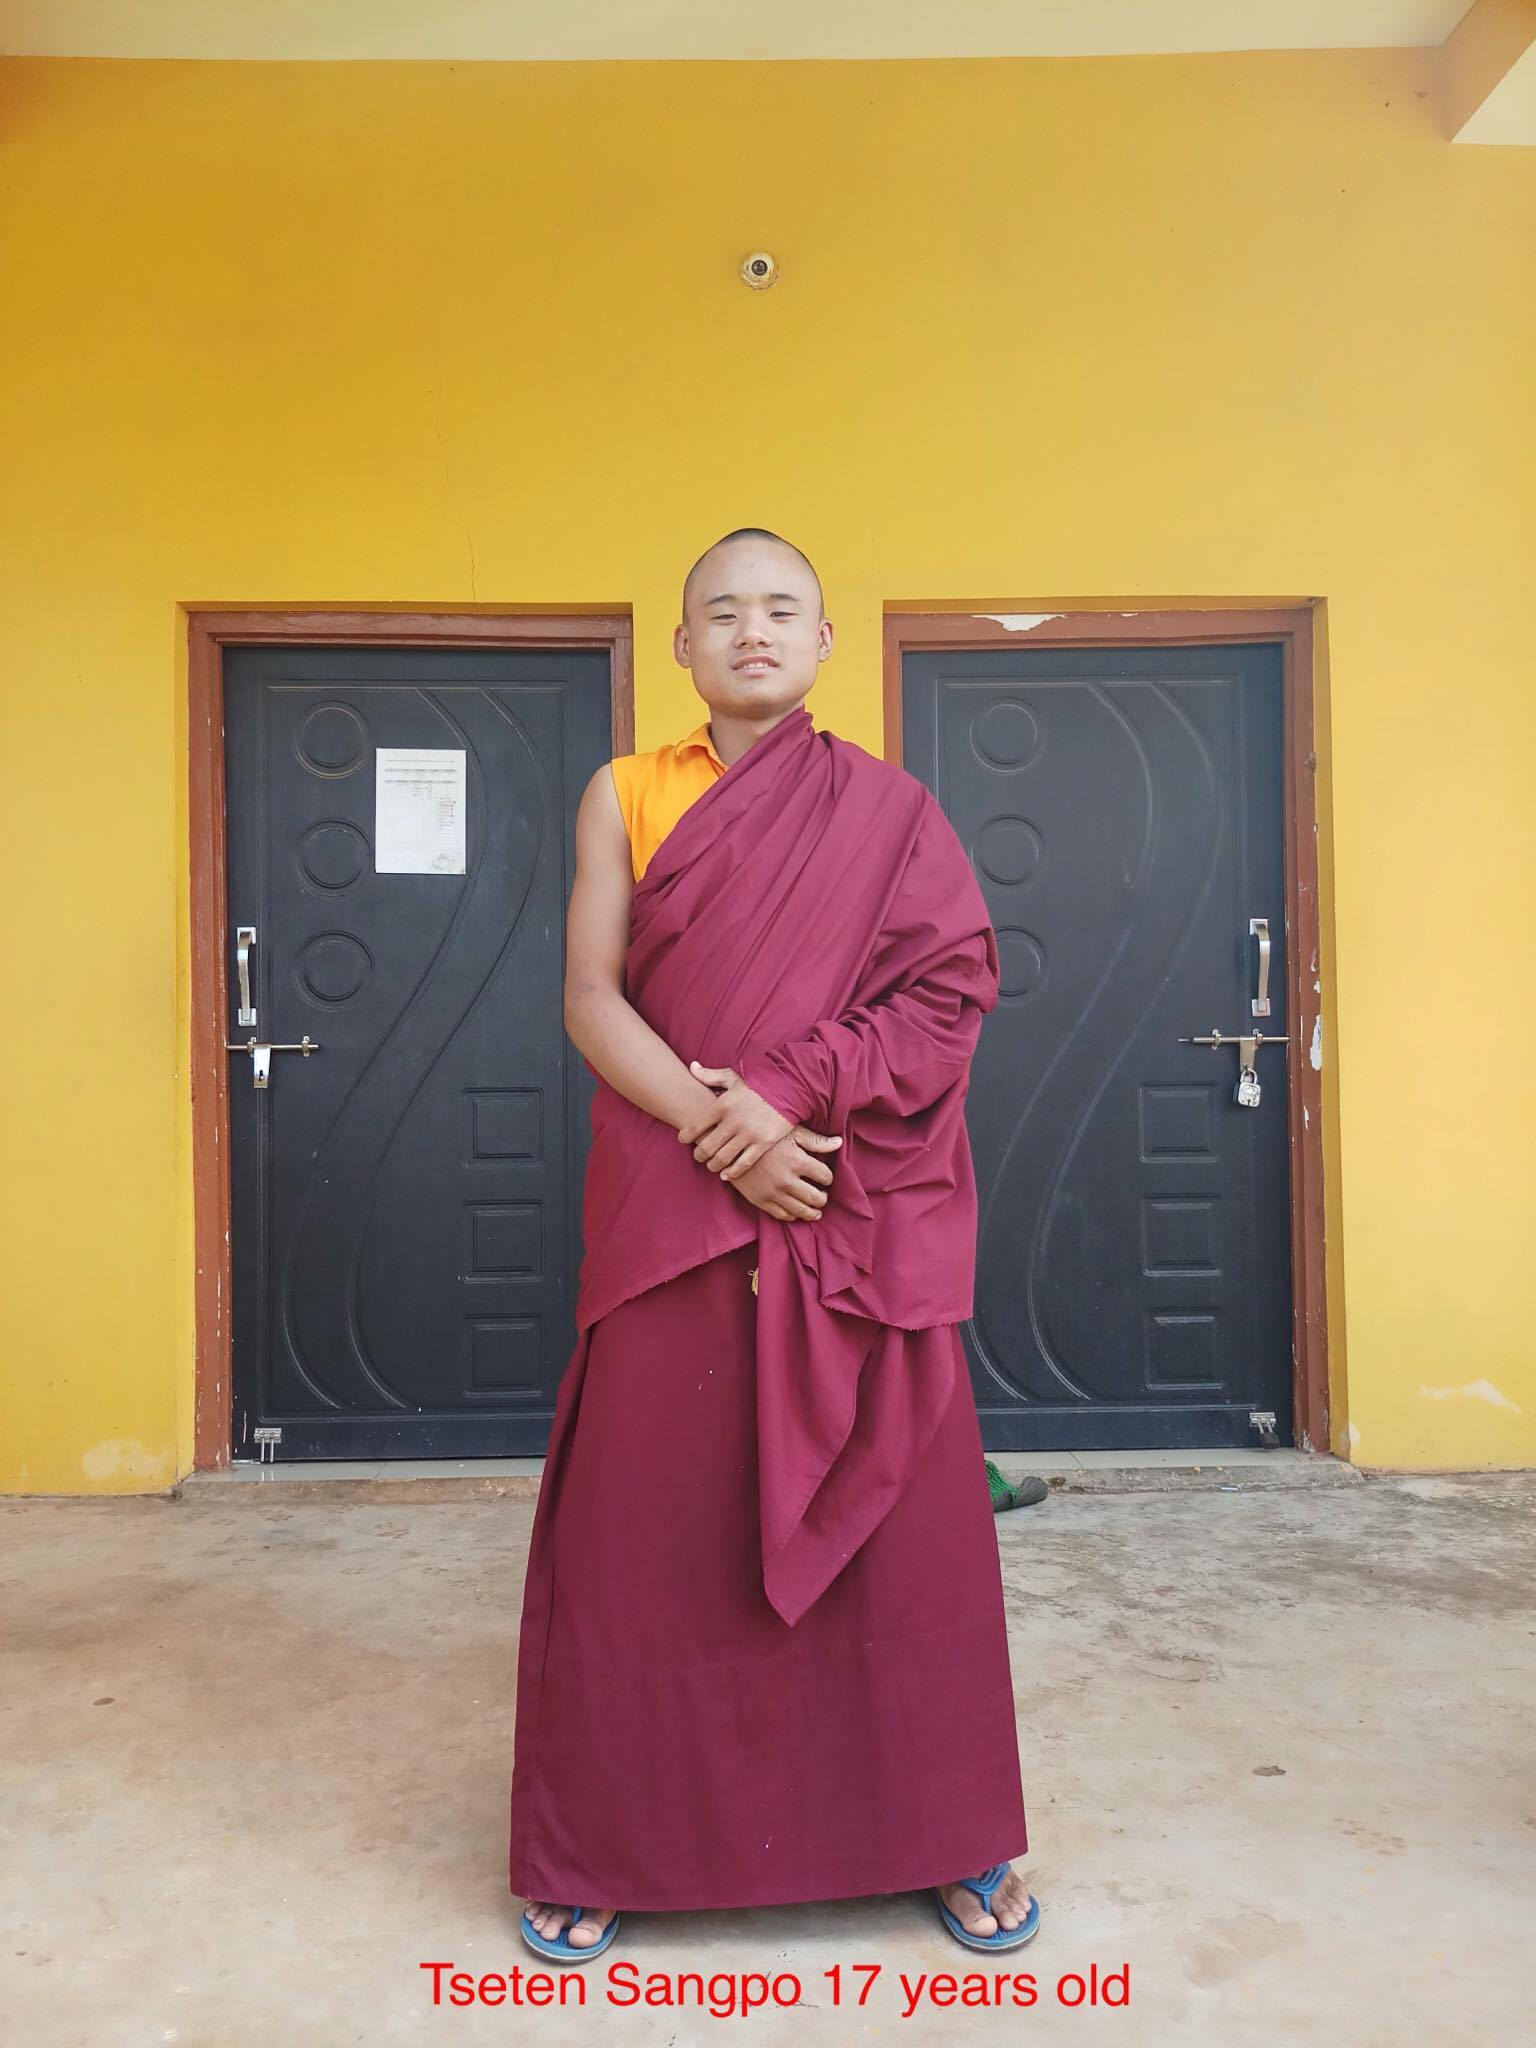 Monk_Tseten_Sangpo_17yrs_old.jpg